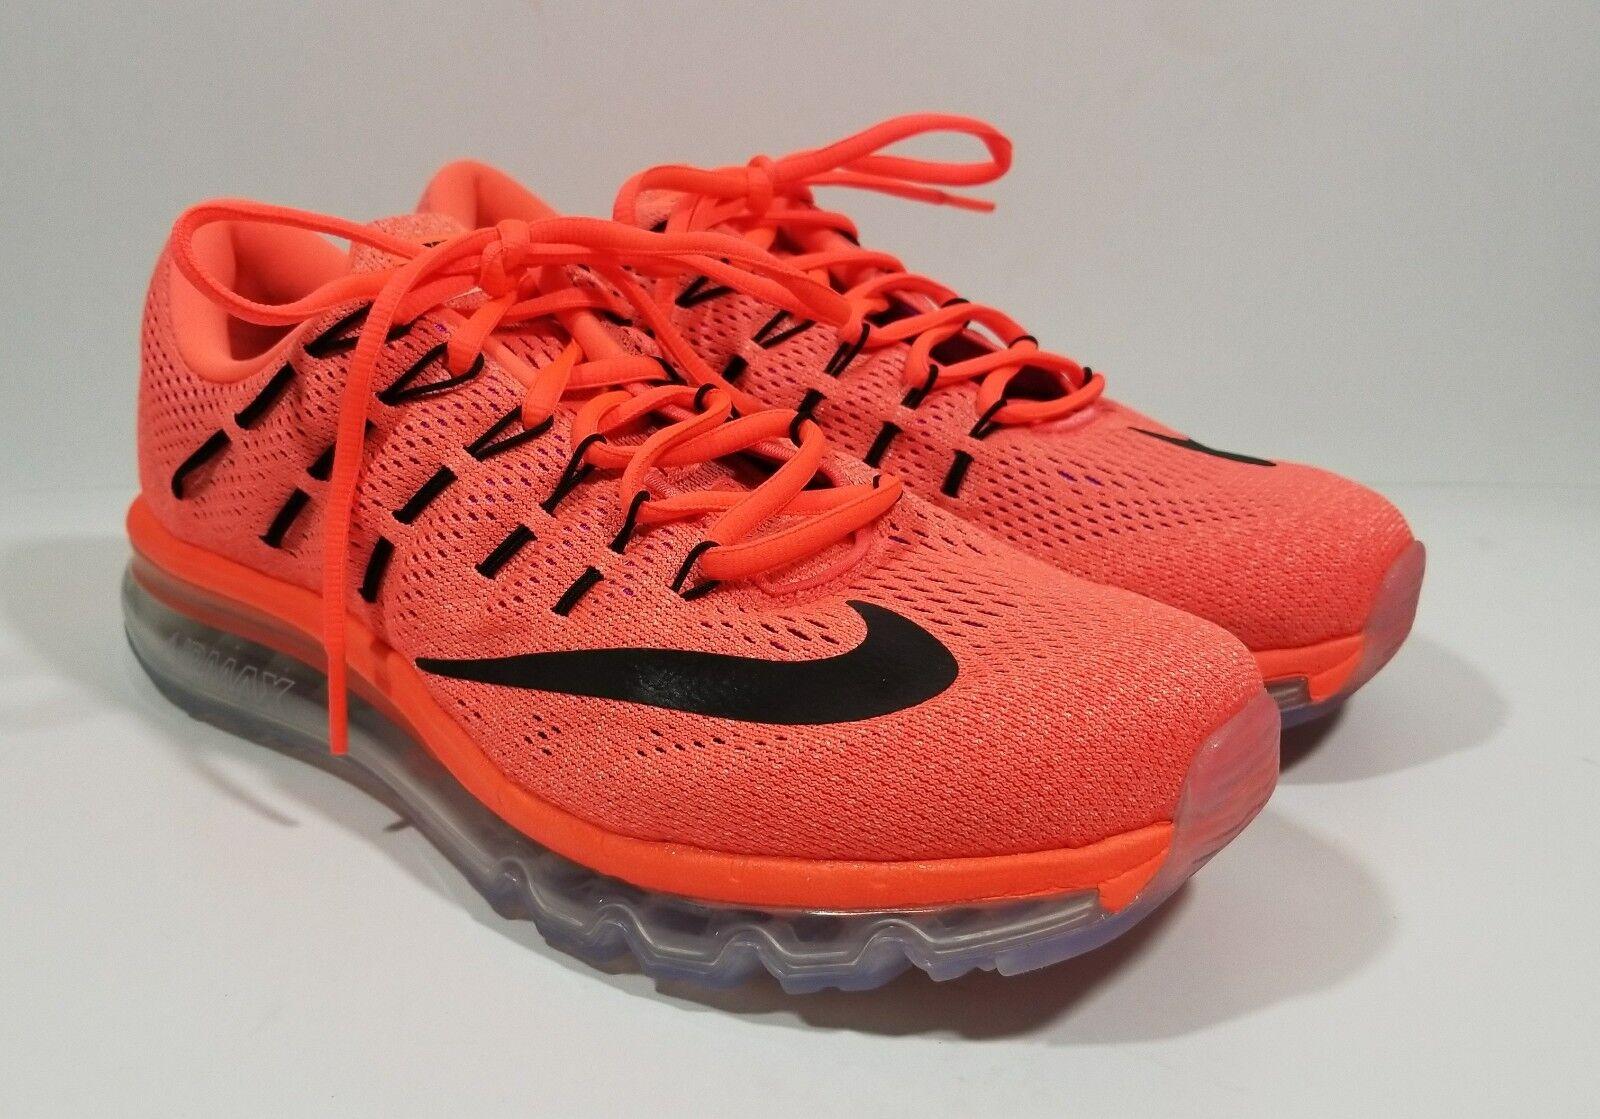 Nike Air Max 2018 Womens Running Cross Training Shoes Orange Black Comfortable Great discount